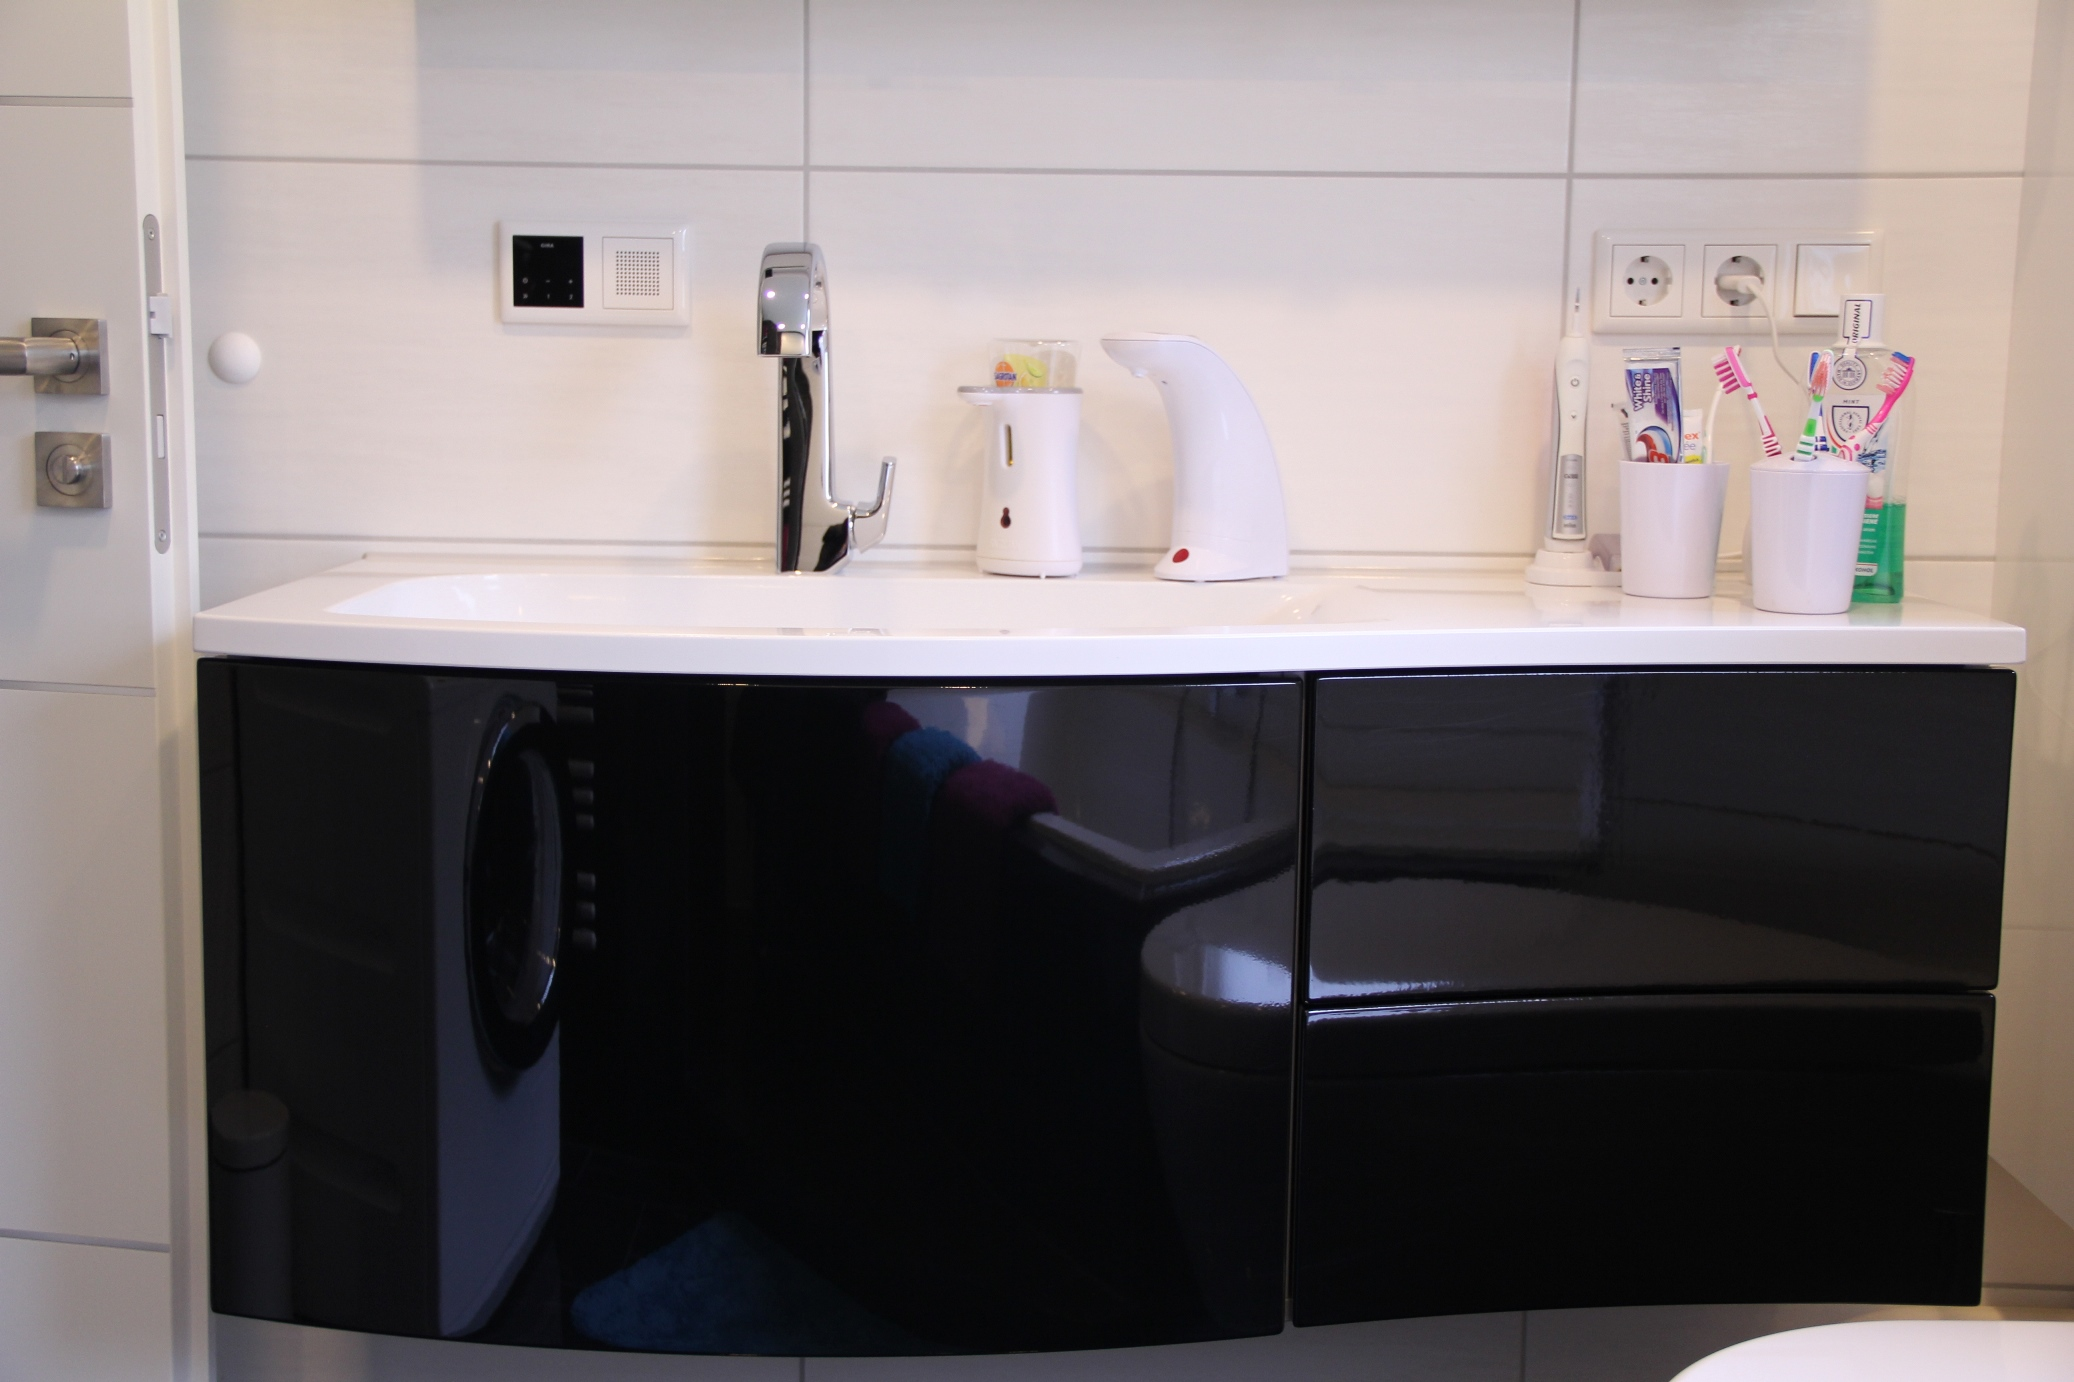 badezimmer lautsprecher. Black Bedroom Furniture Sets. Home Design Ideas